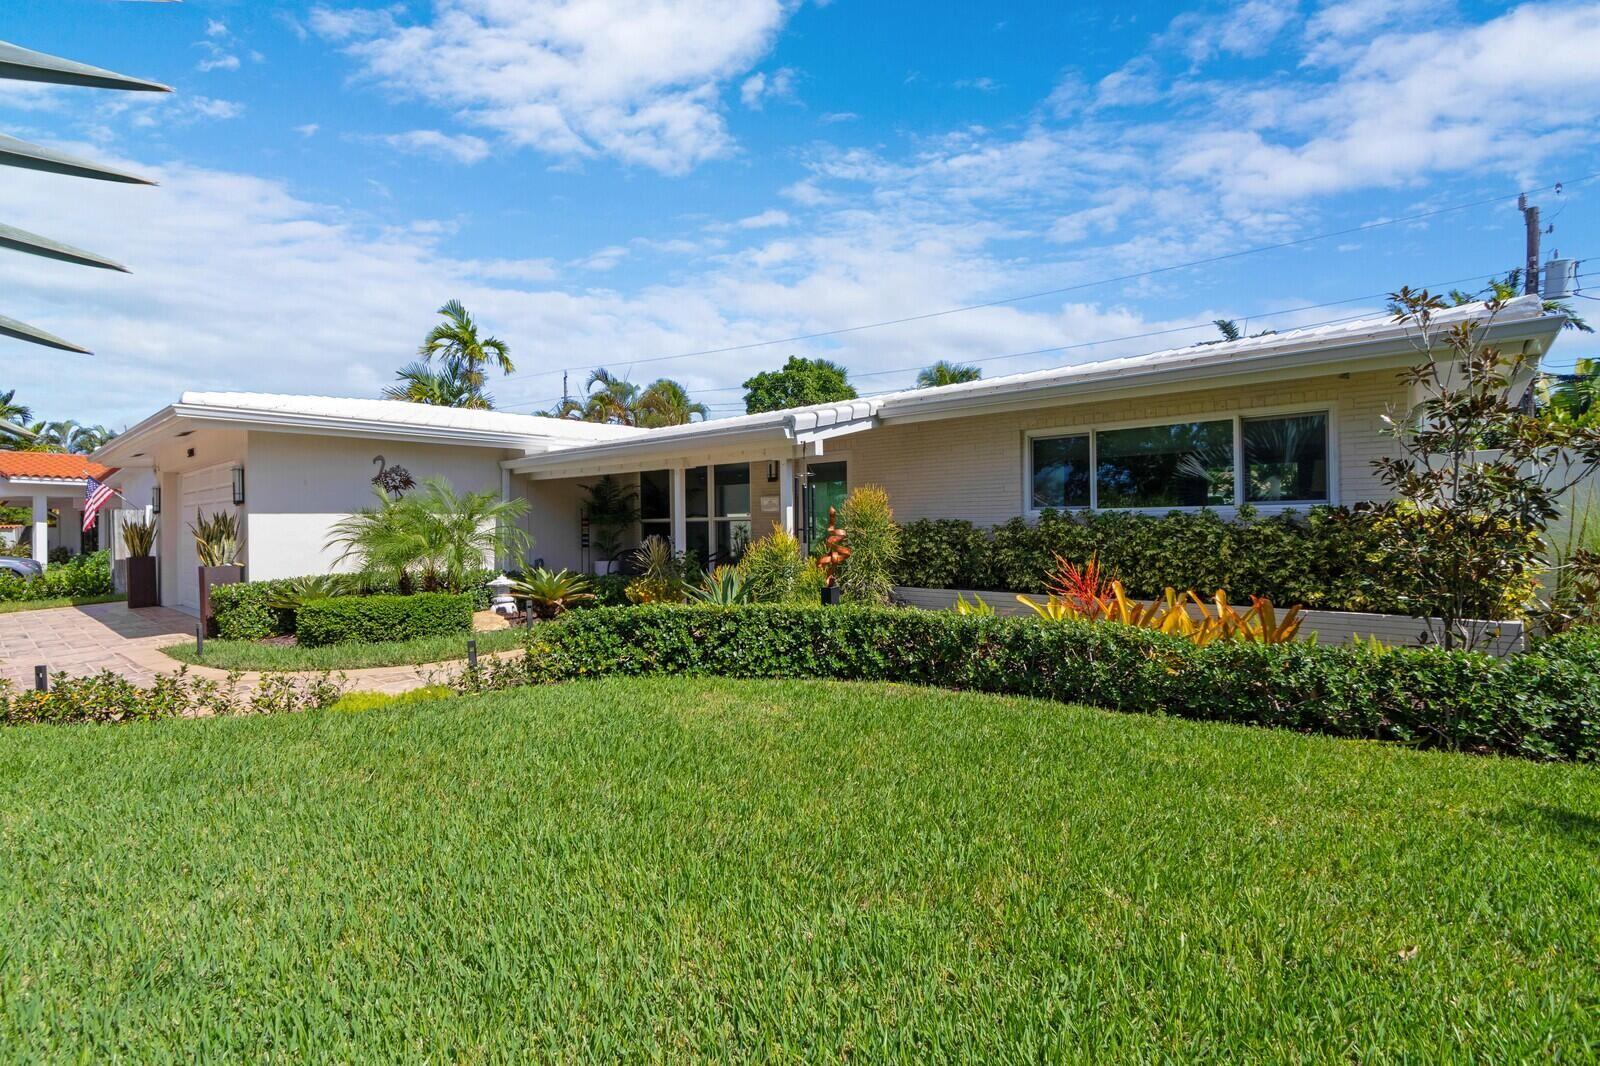 Photo of 5900 NE 21st Terrace, Fort Lauderdale, FL 33308 (MLS # RX-10753510)